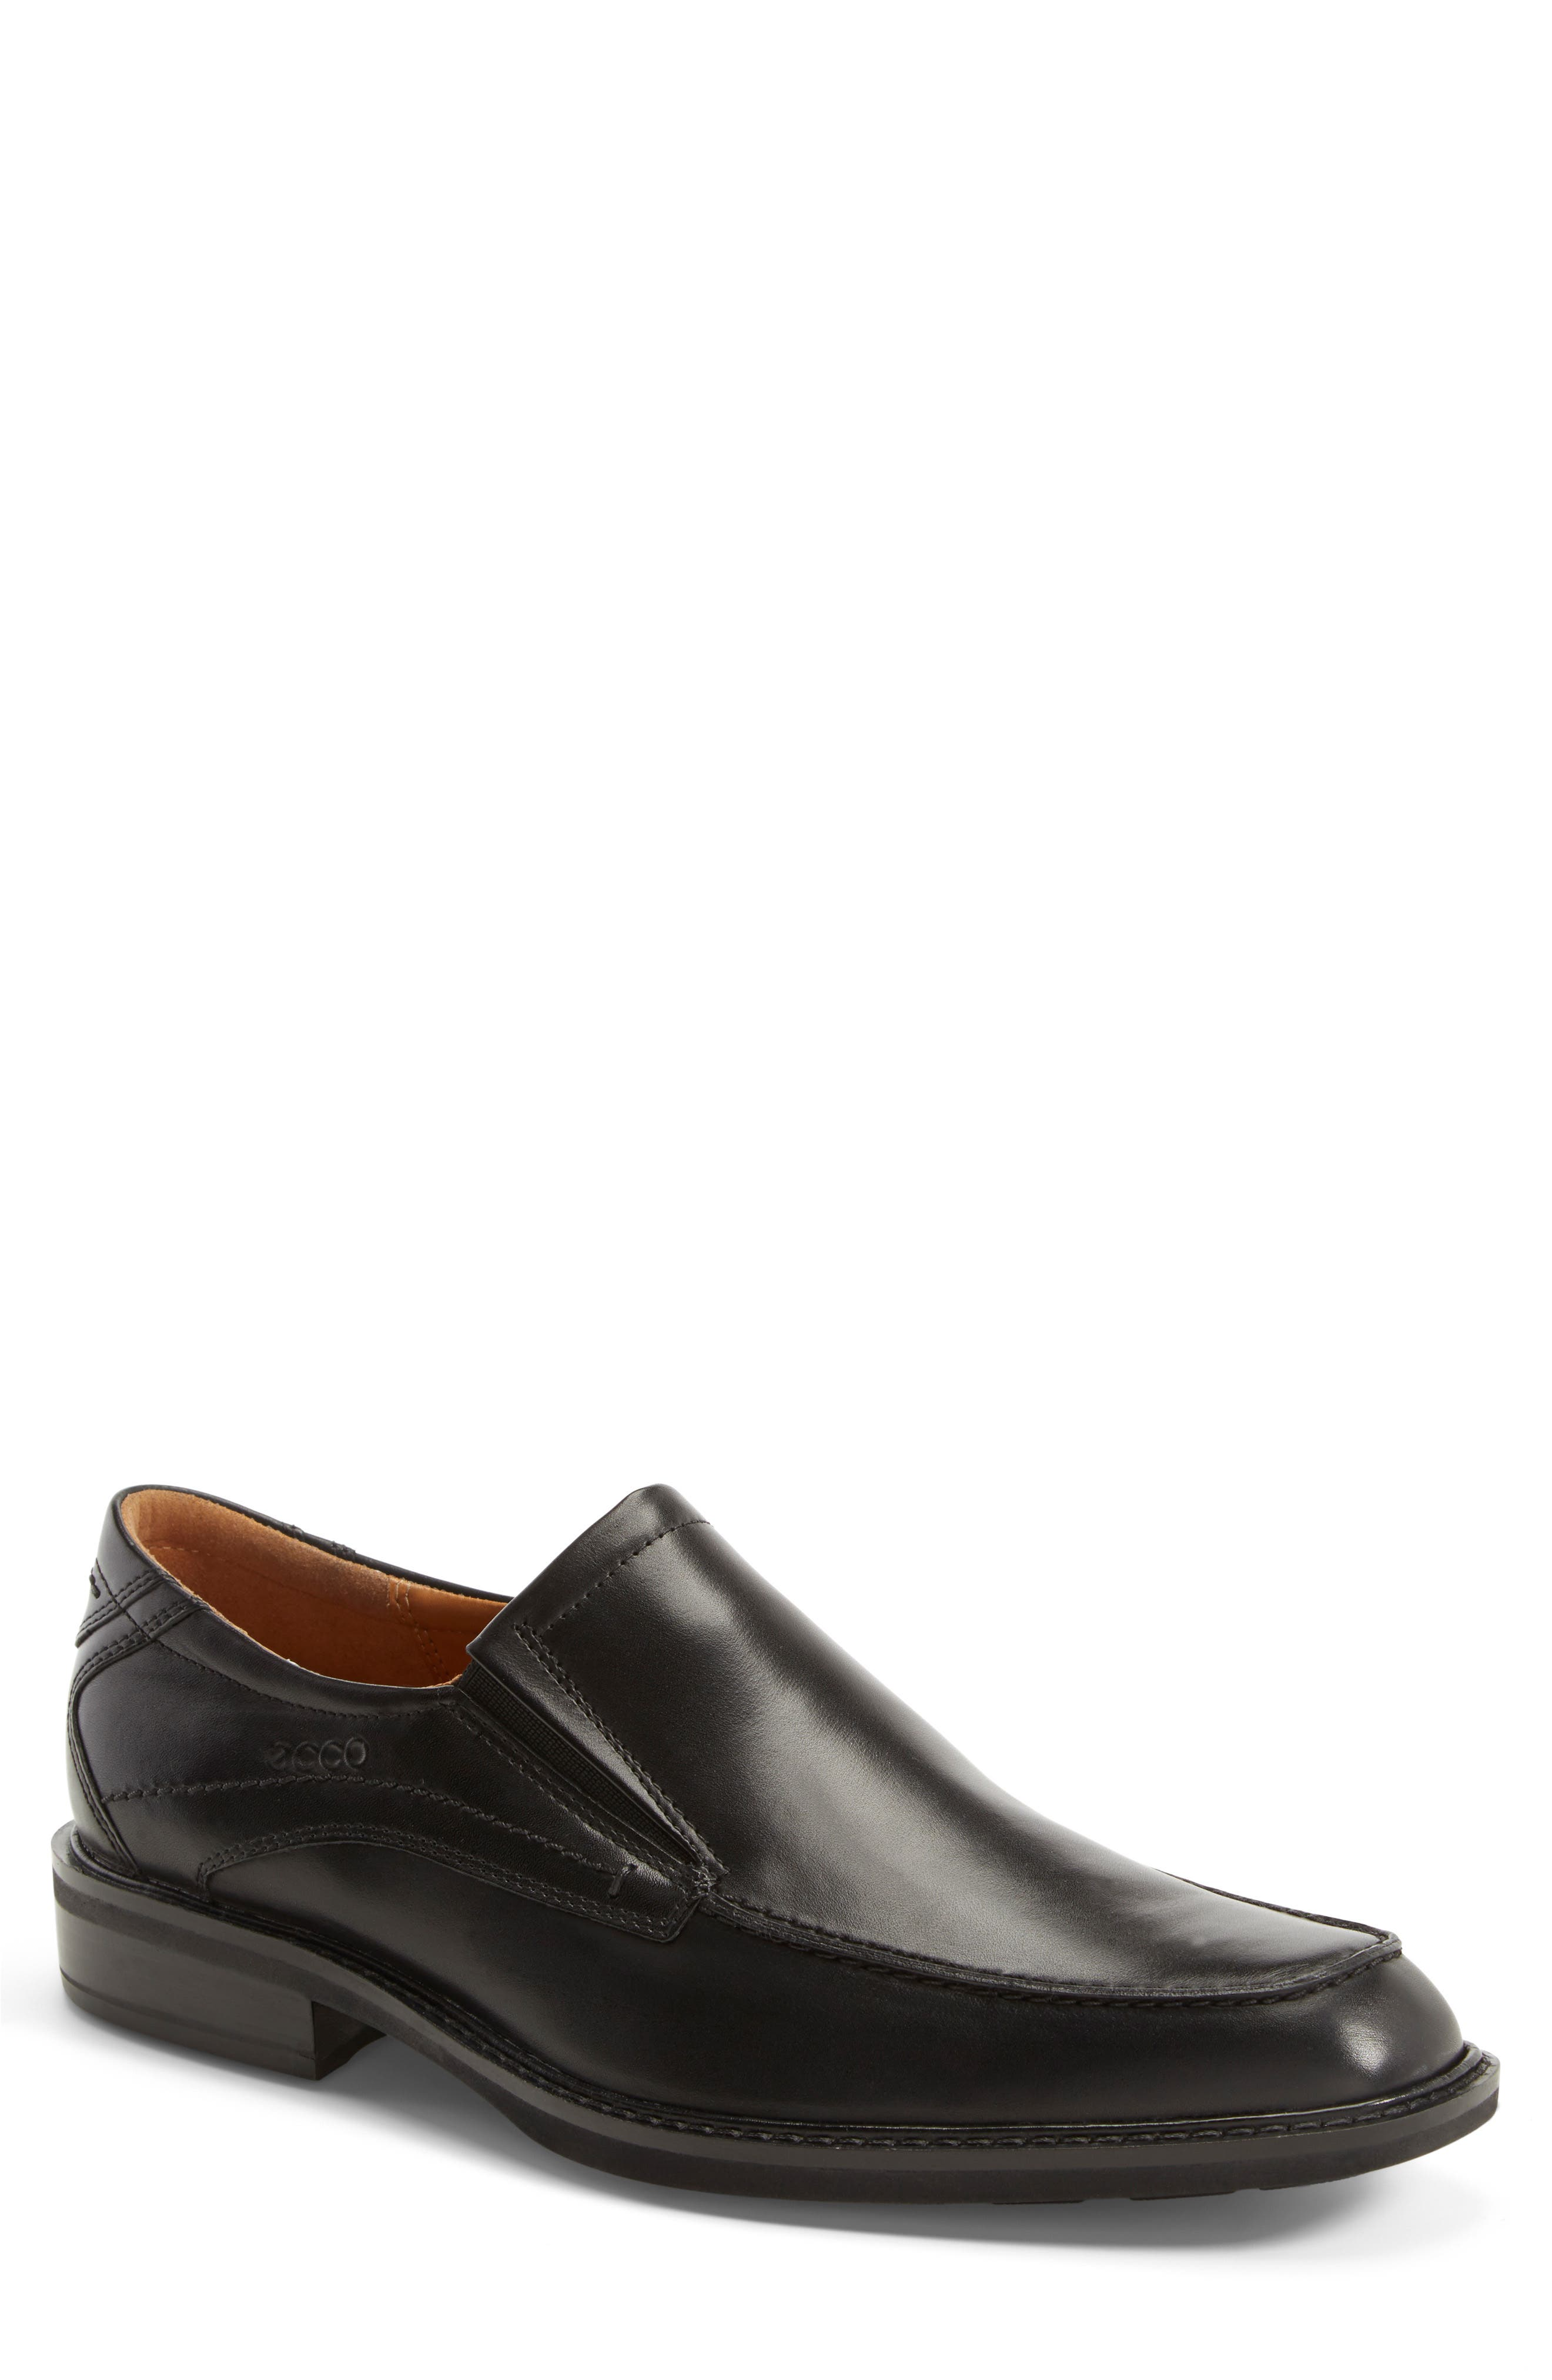 'Windsor' Slip-On,                             Main thumbnail 1, color,                             Black/Black Leather